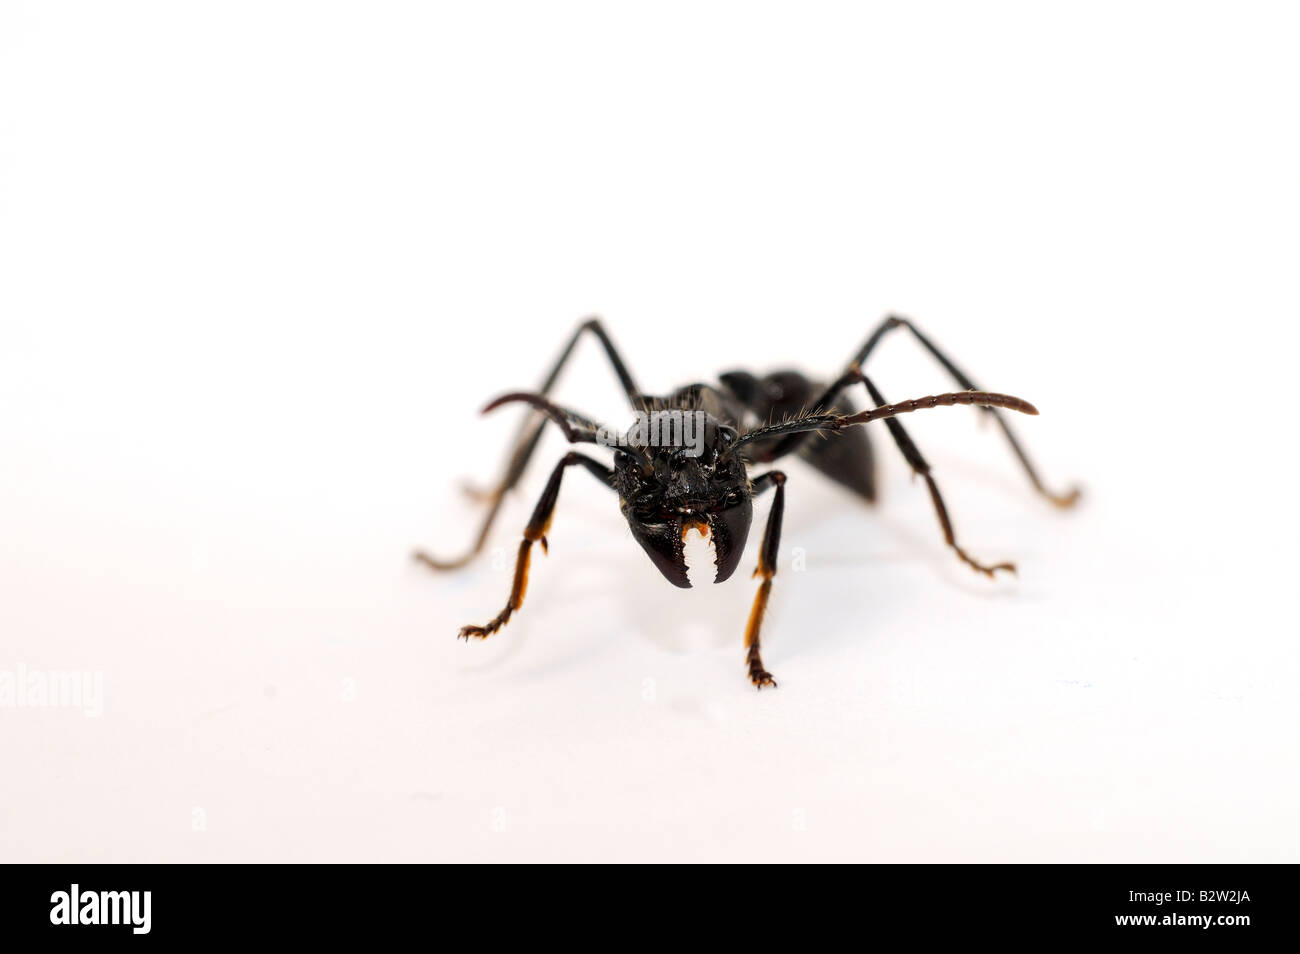 Isula or Bullet Ant Paraponera clavata Stock Photo